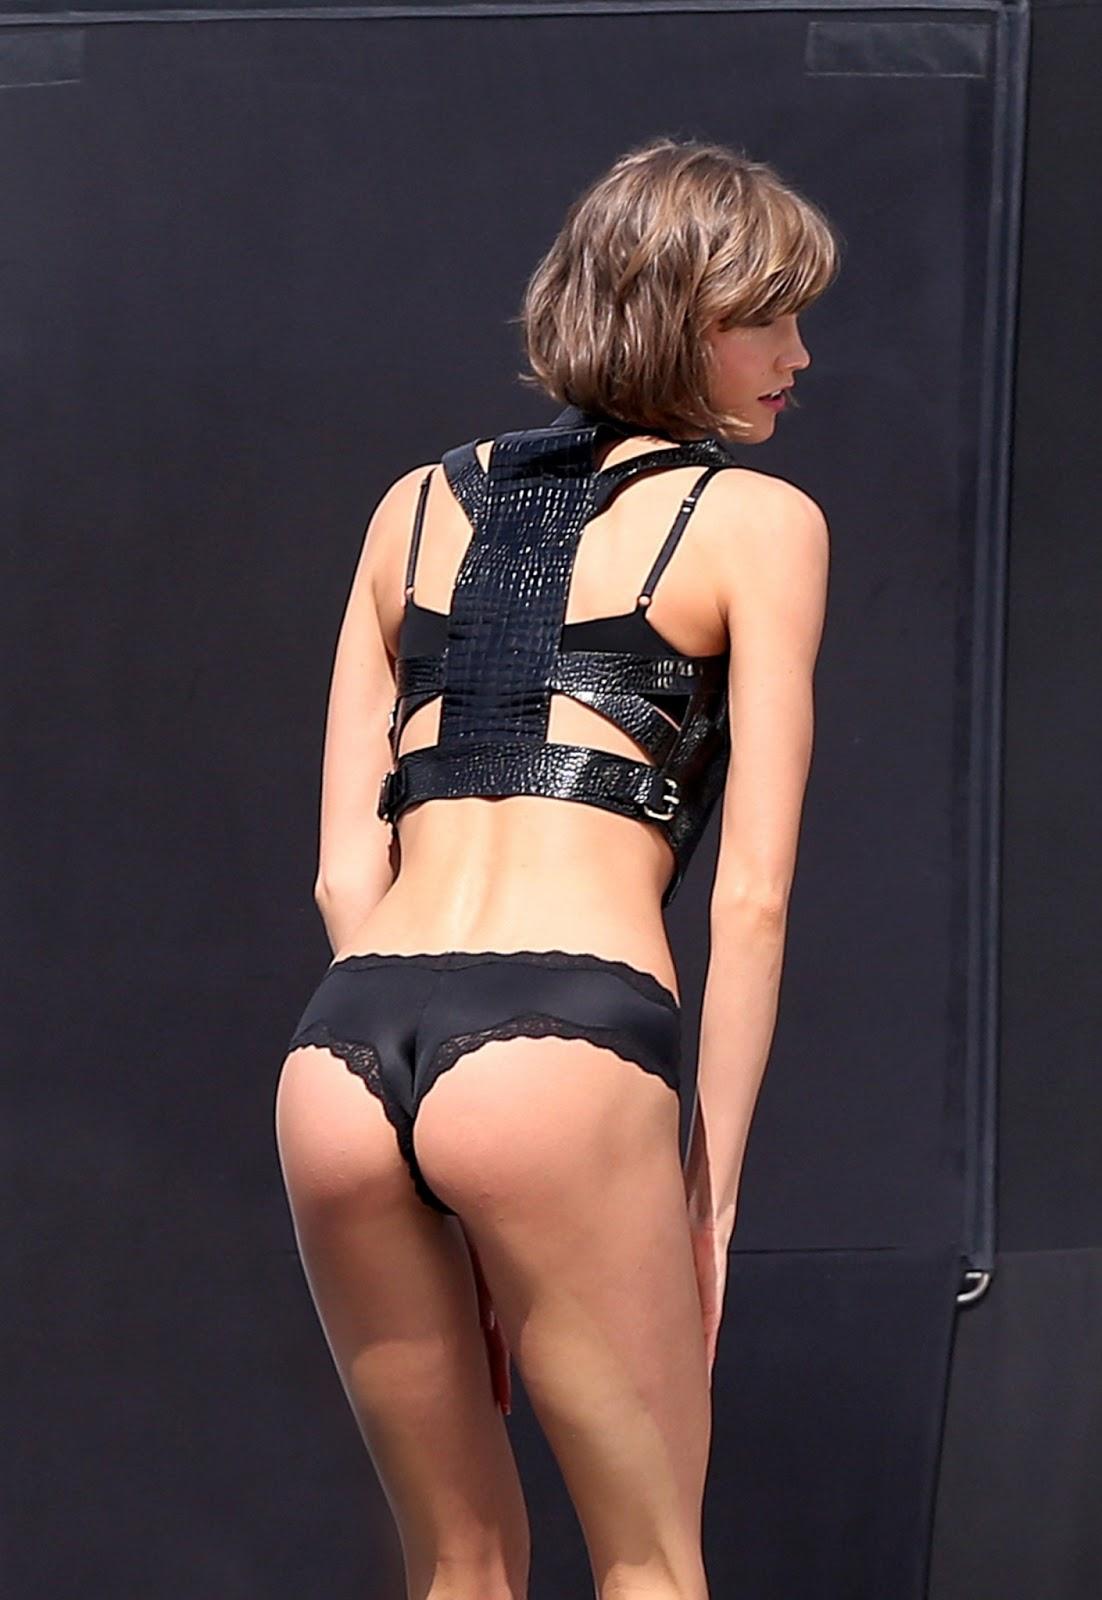 Karlie Kloss - Victoria's Secret Photoshoot Candids in Miami ~ R2D3 Celebscon